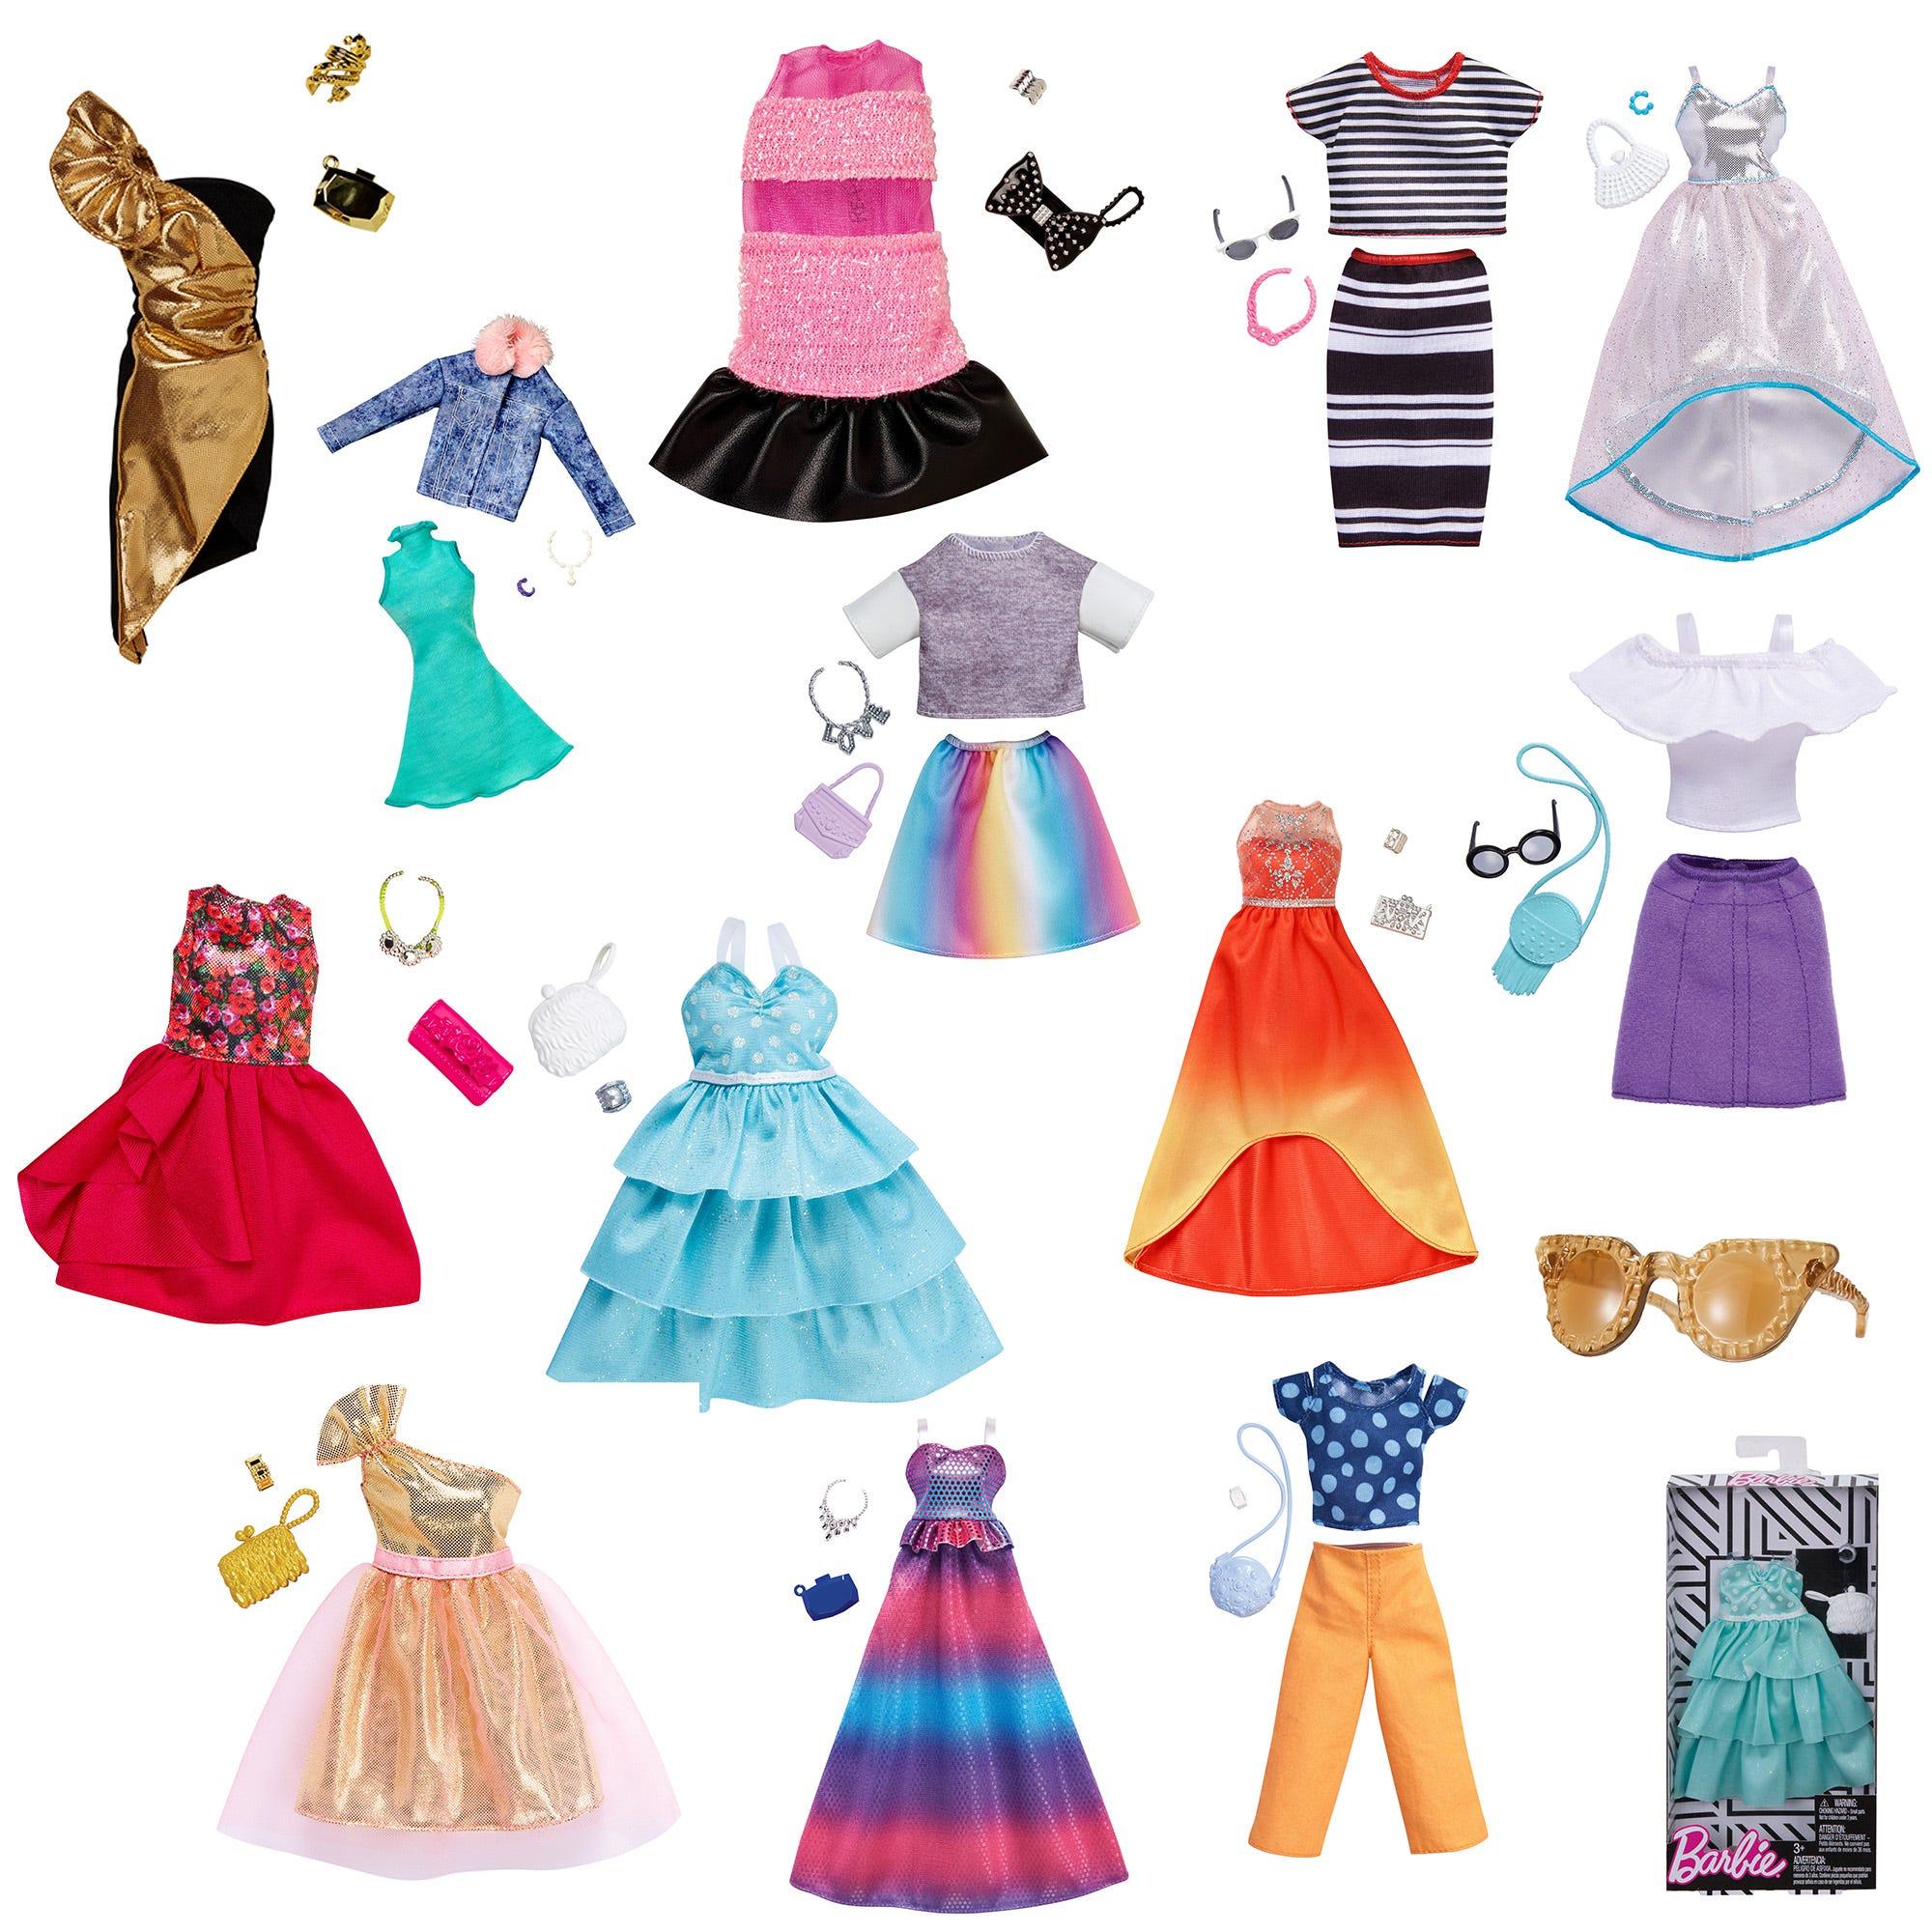 Barbie Complete Looks Fashion Assortment